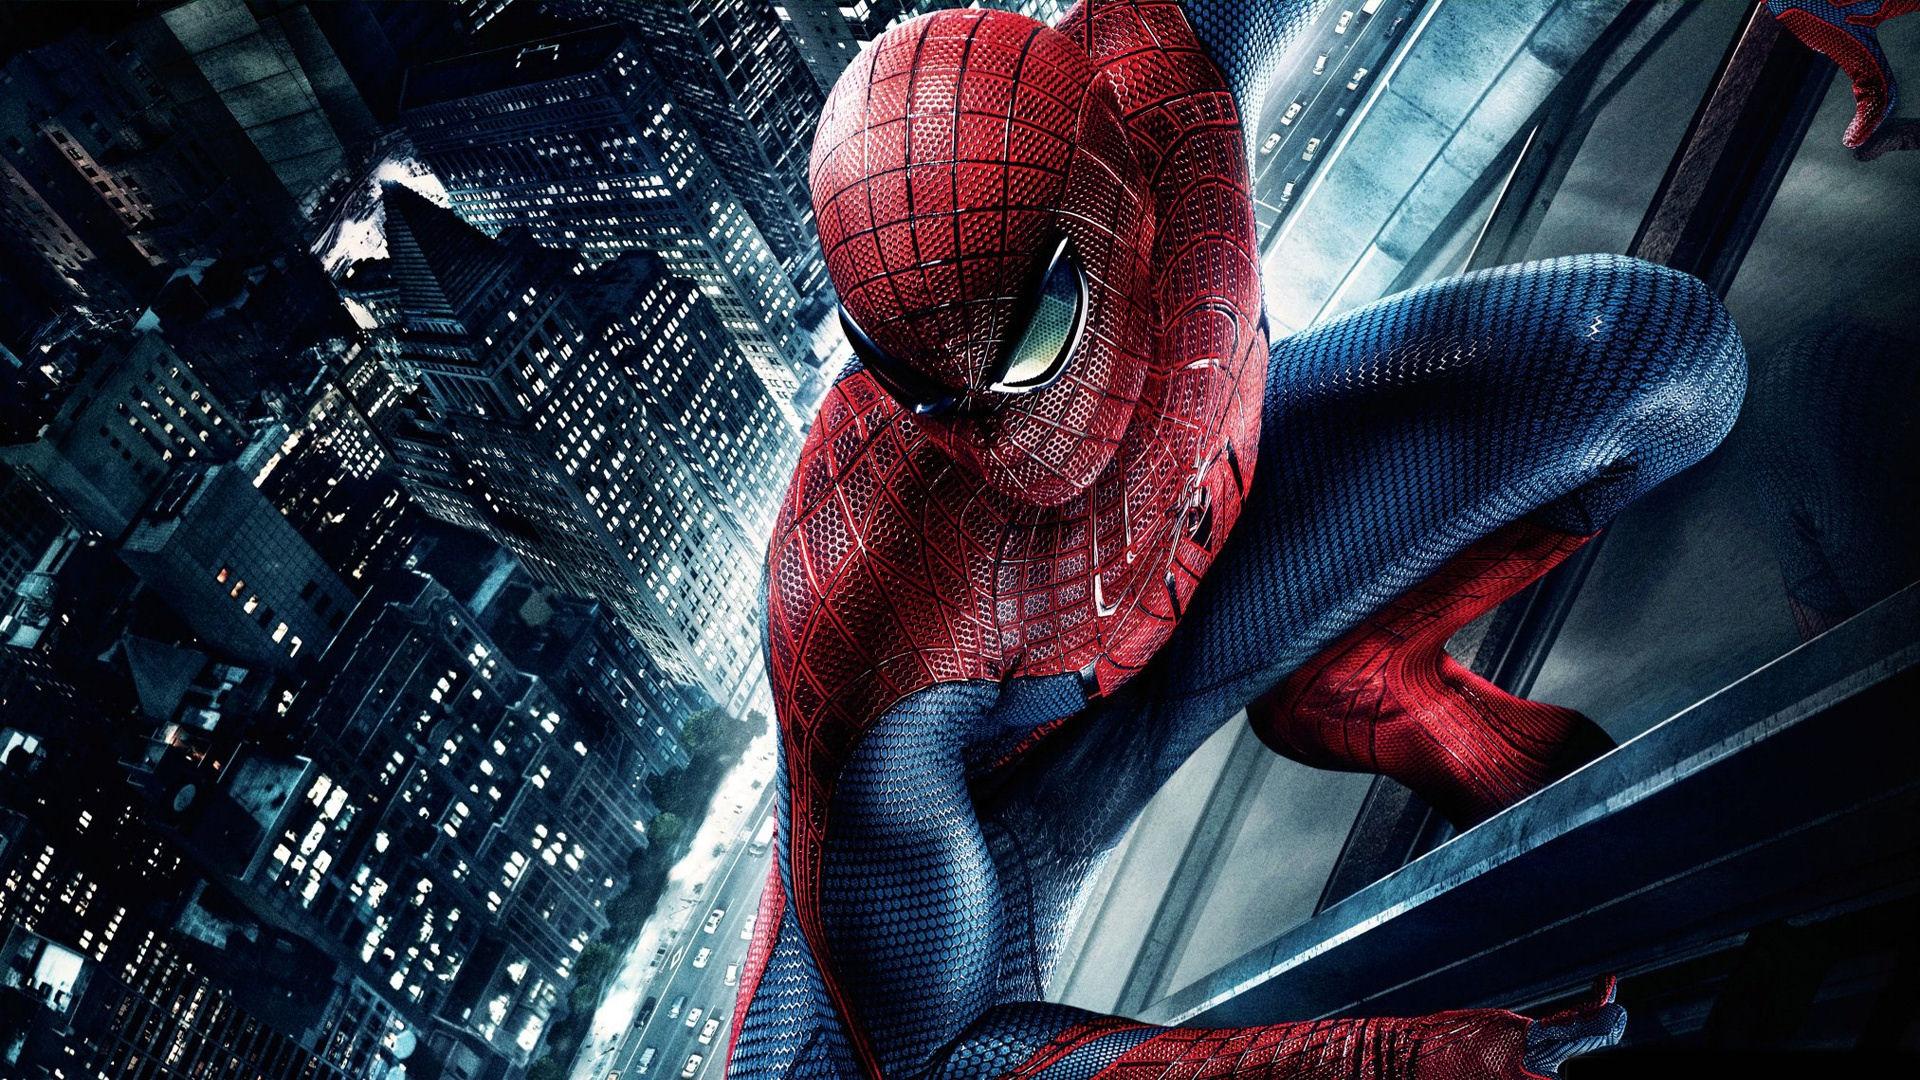 The Amazing Spider Man 2012 Wallpaper Hd